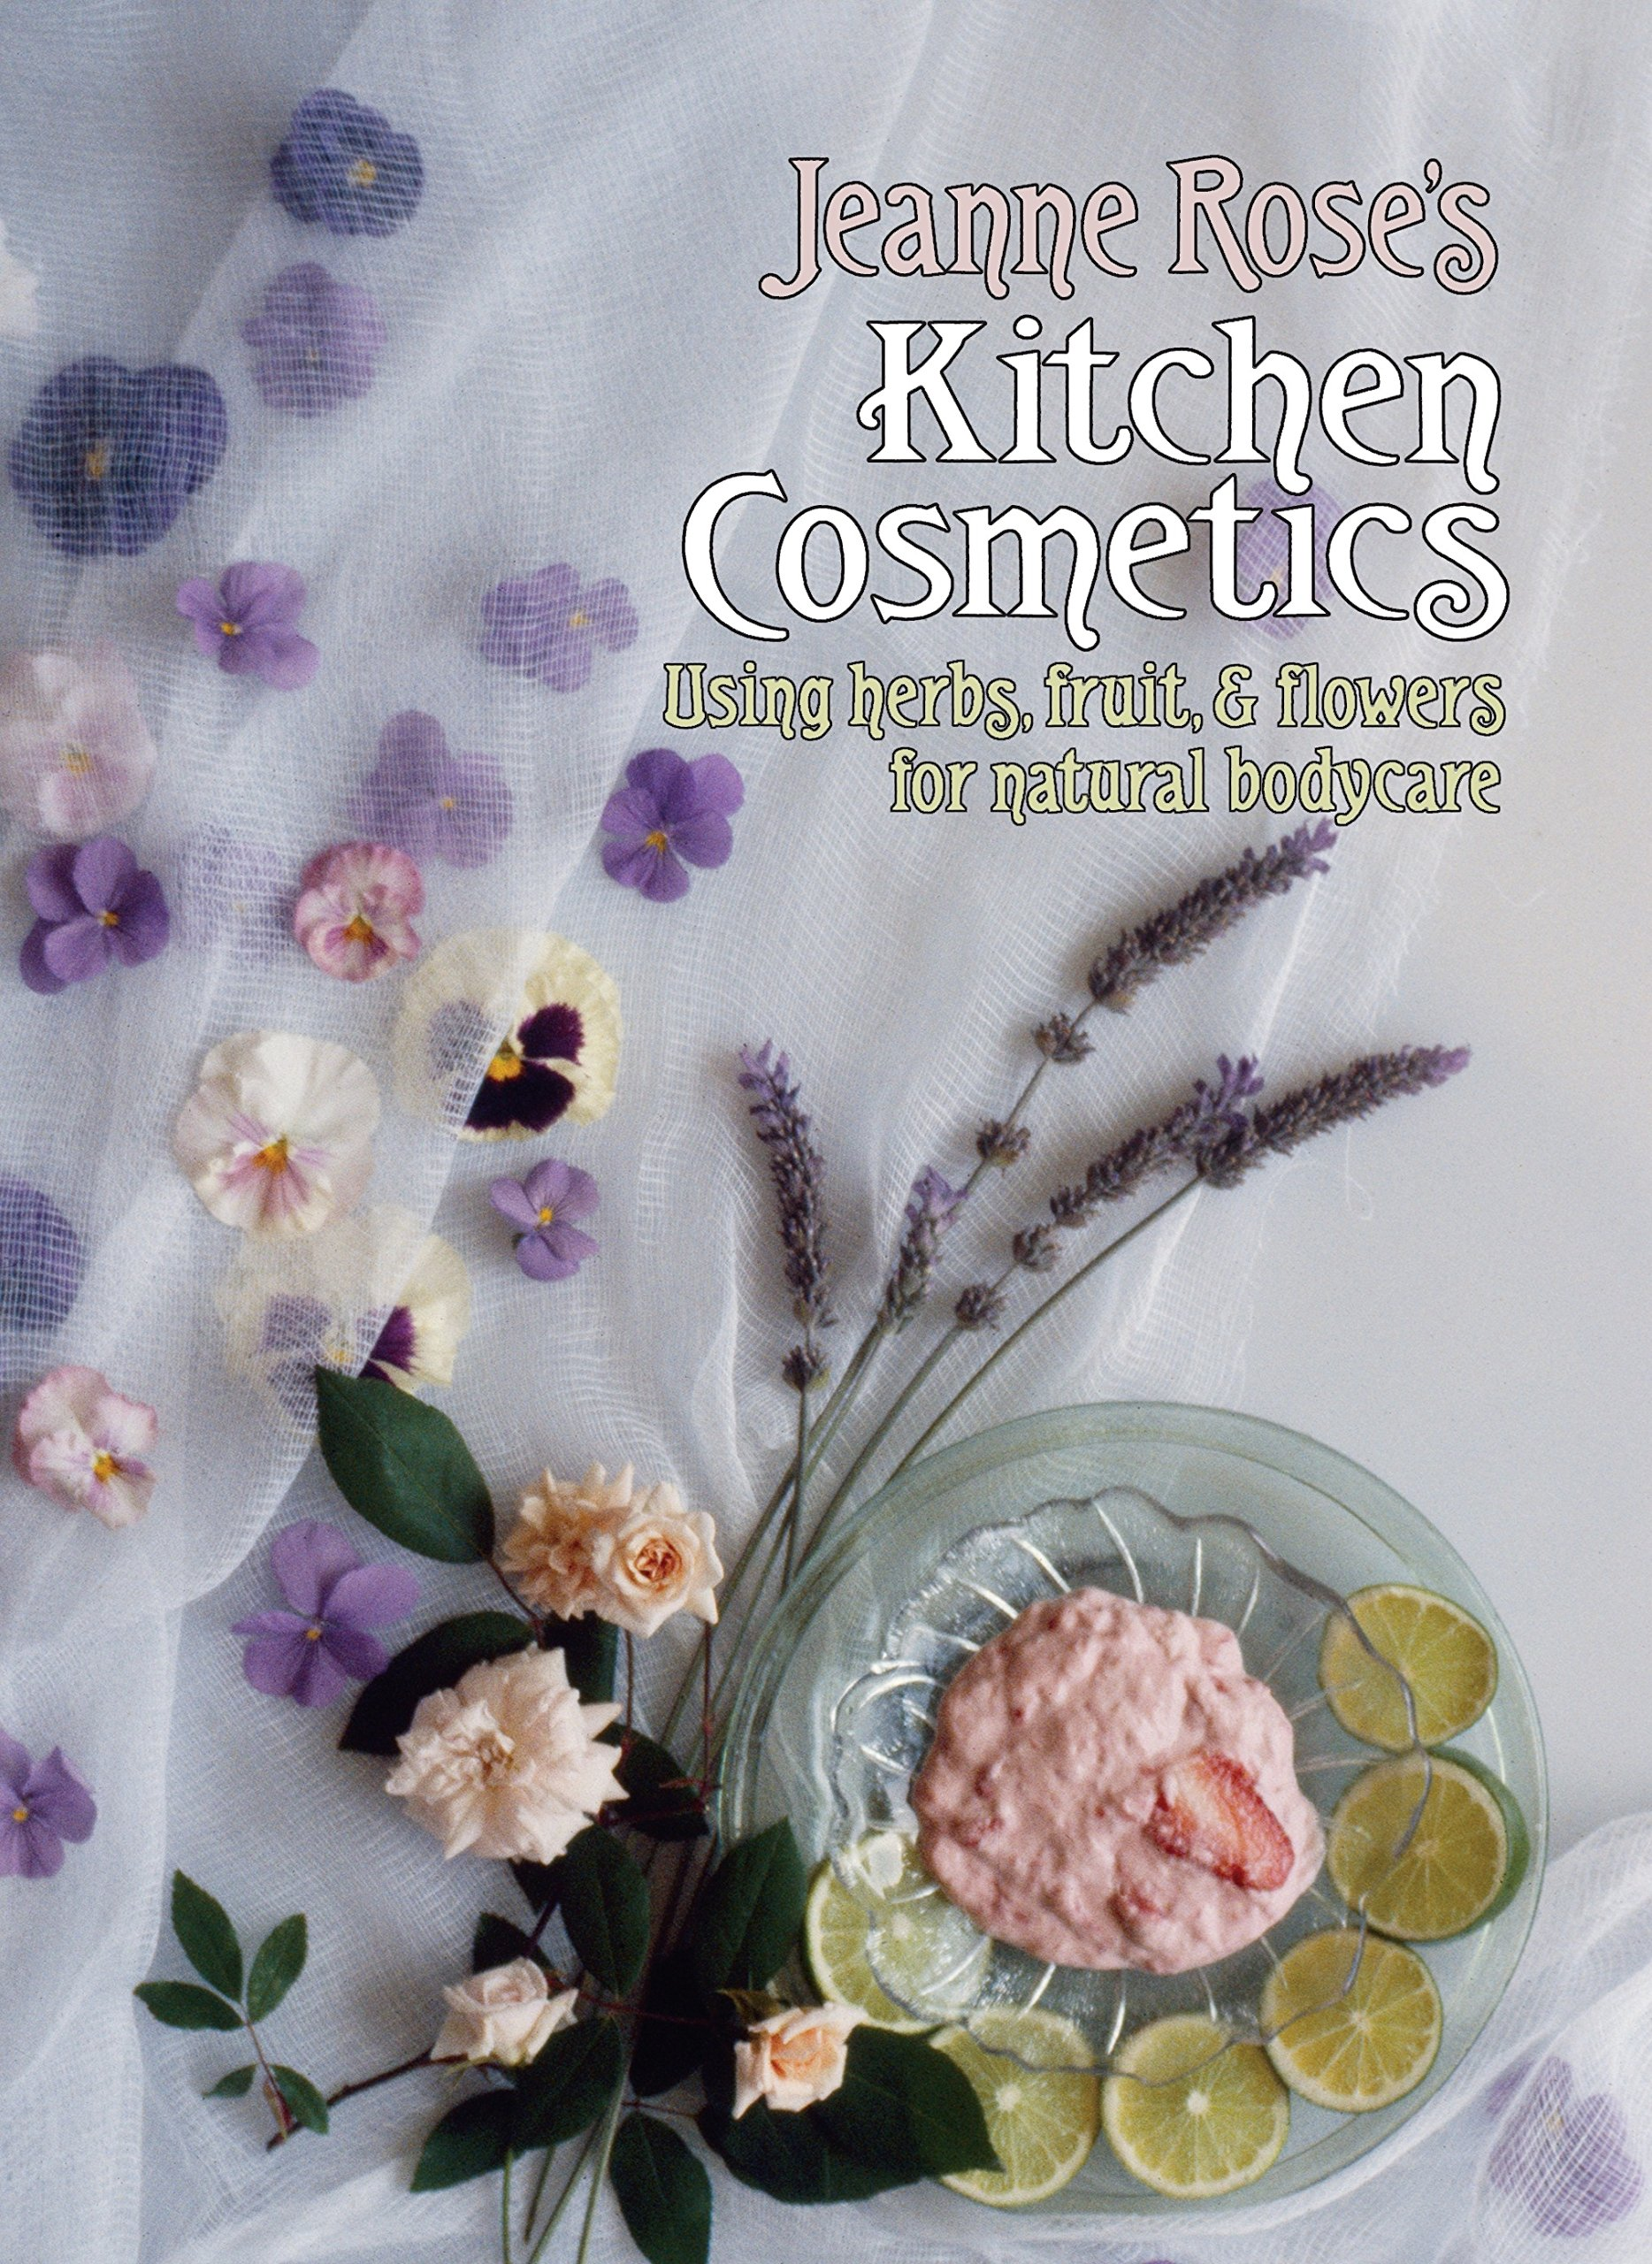 kitchen cosmetics jeanne rose.jpg